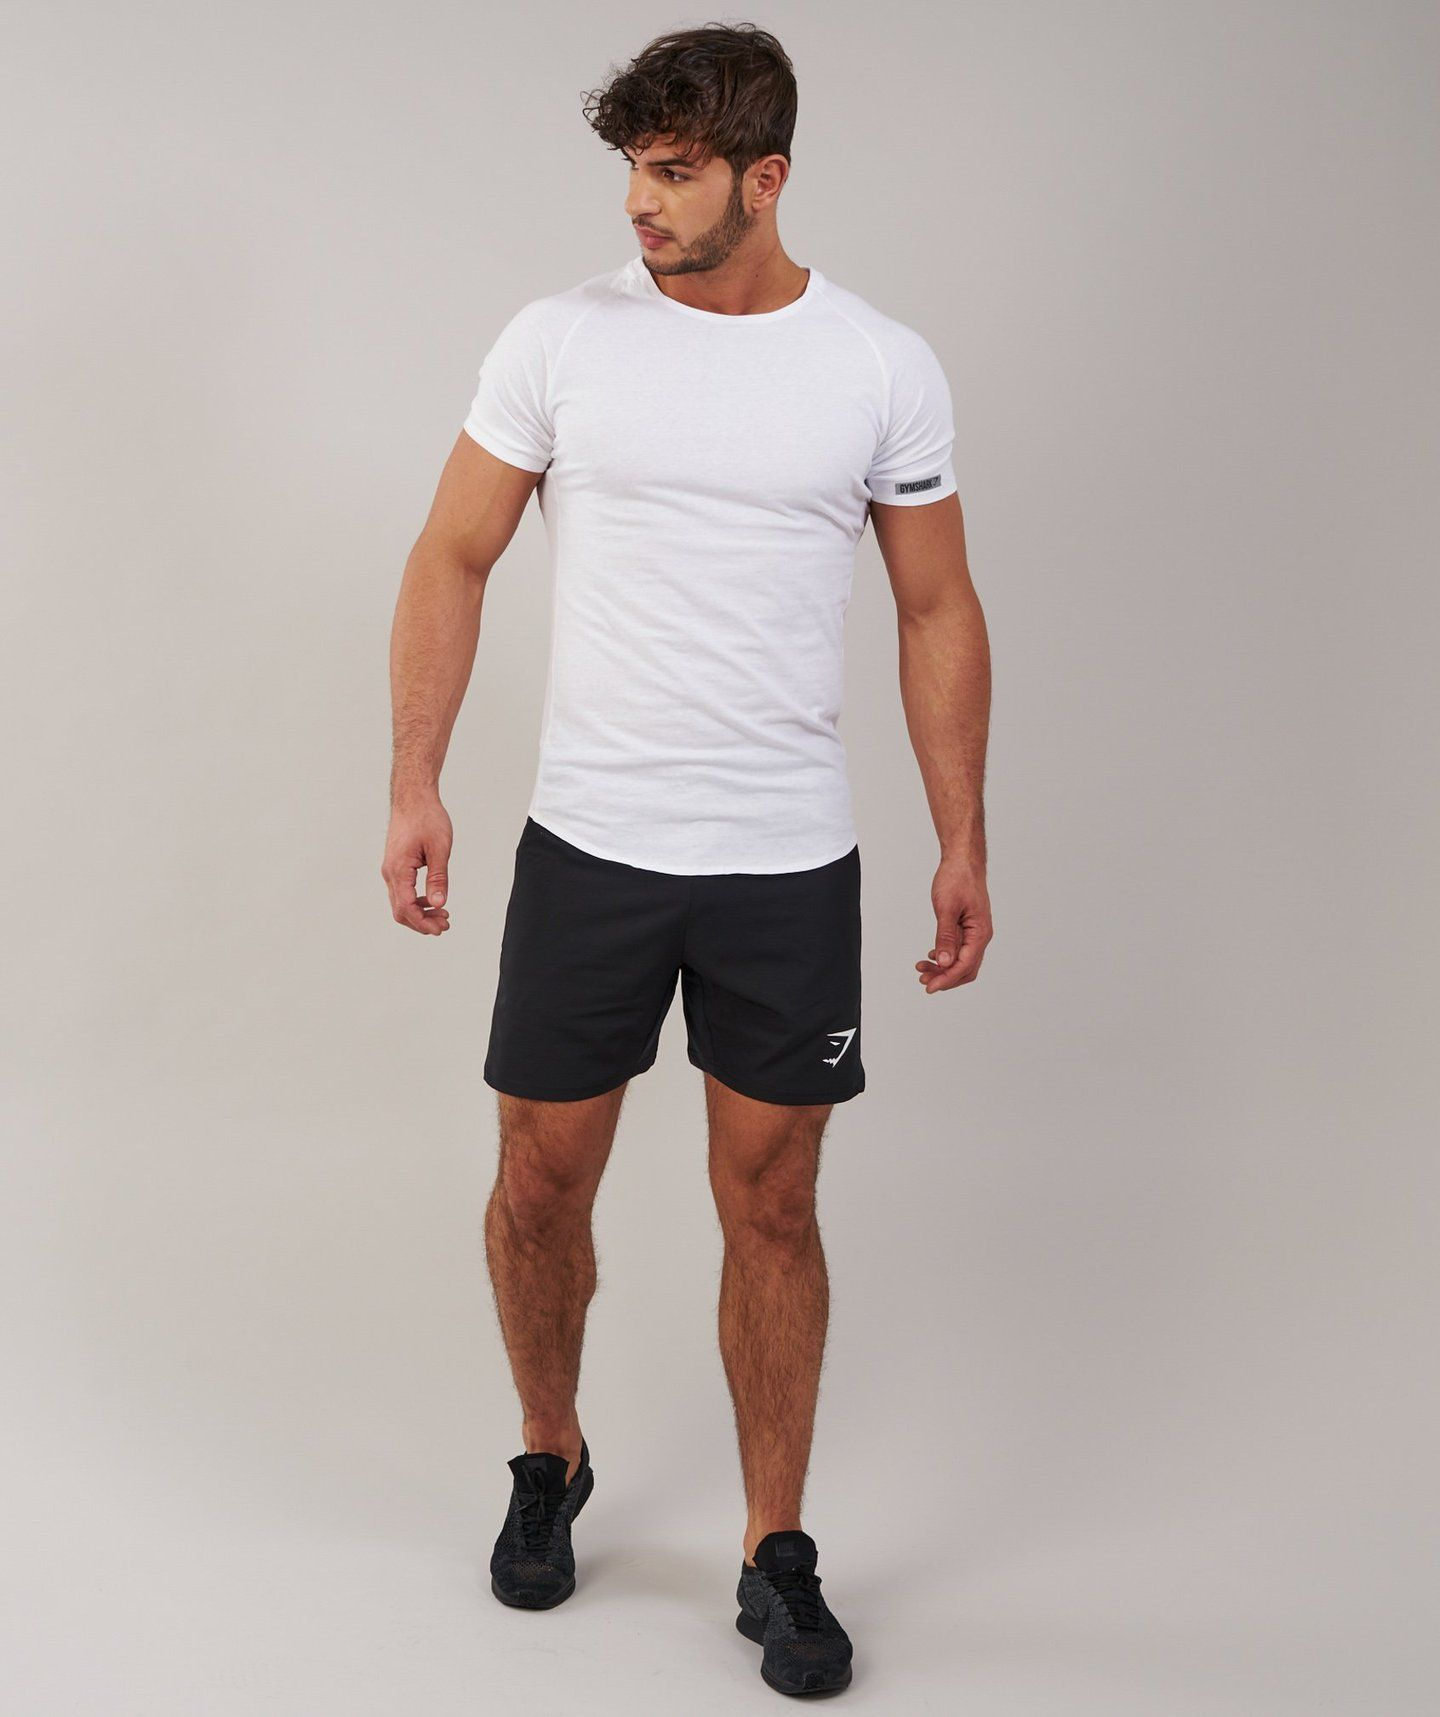 Gymshark Sport Shorts - Black in 2020 | Gym wear men ...